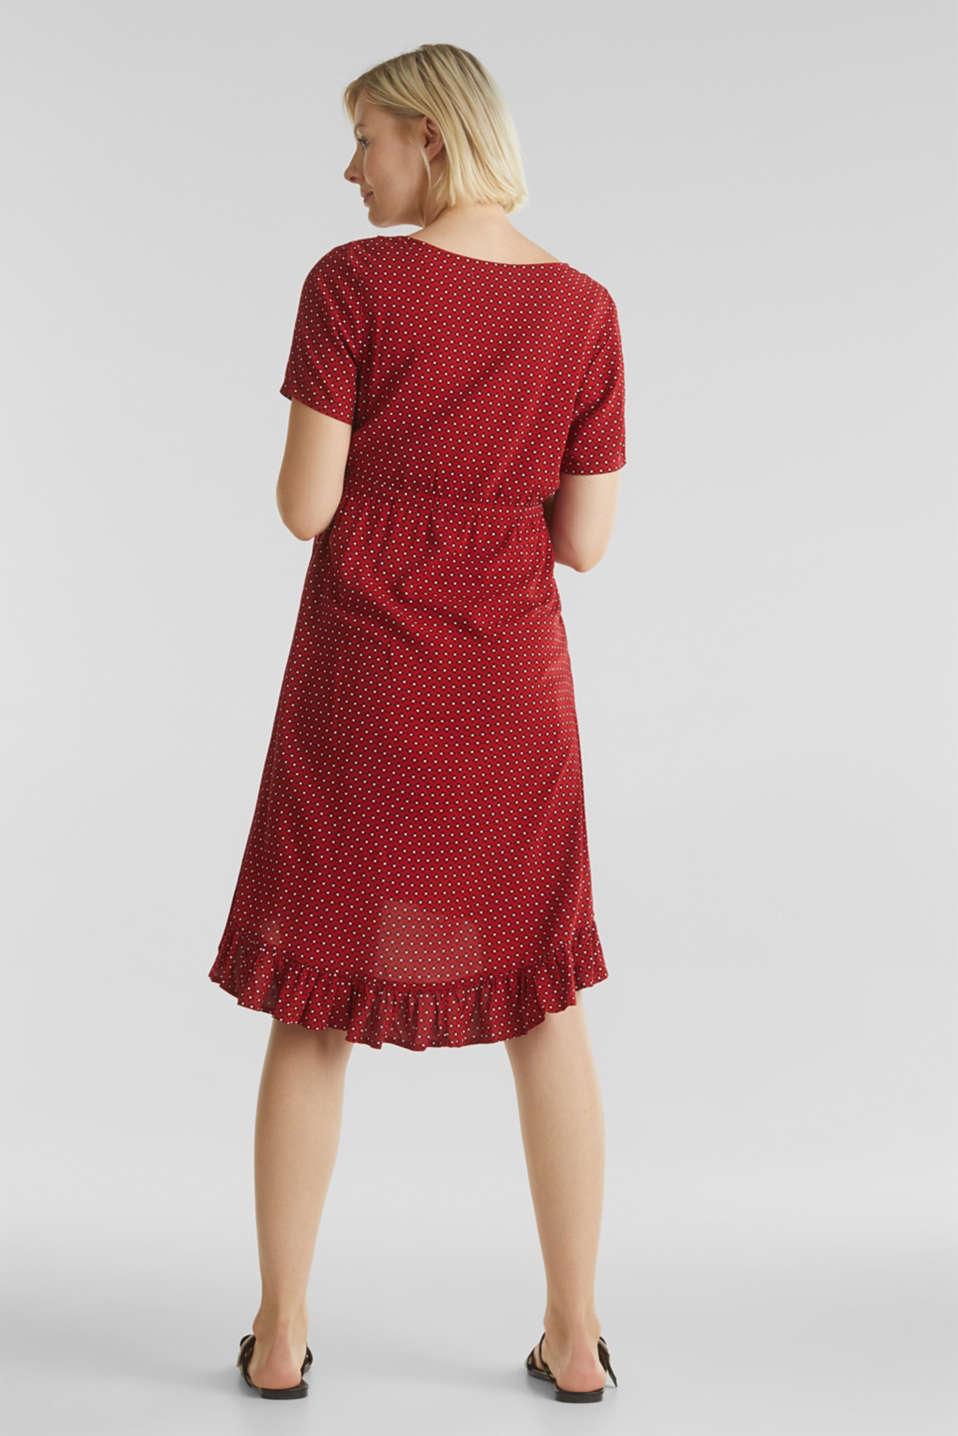 Nursing wrap dress, LCRED, detail image number 2